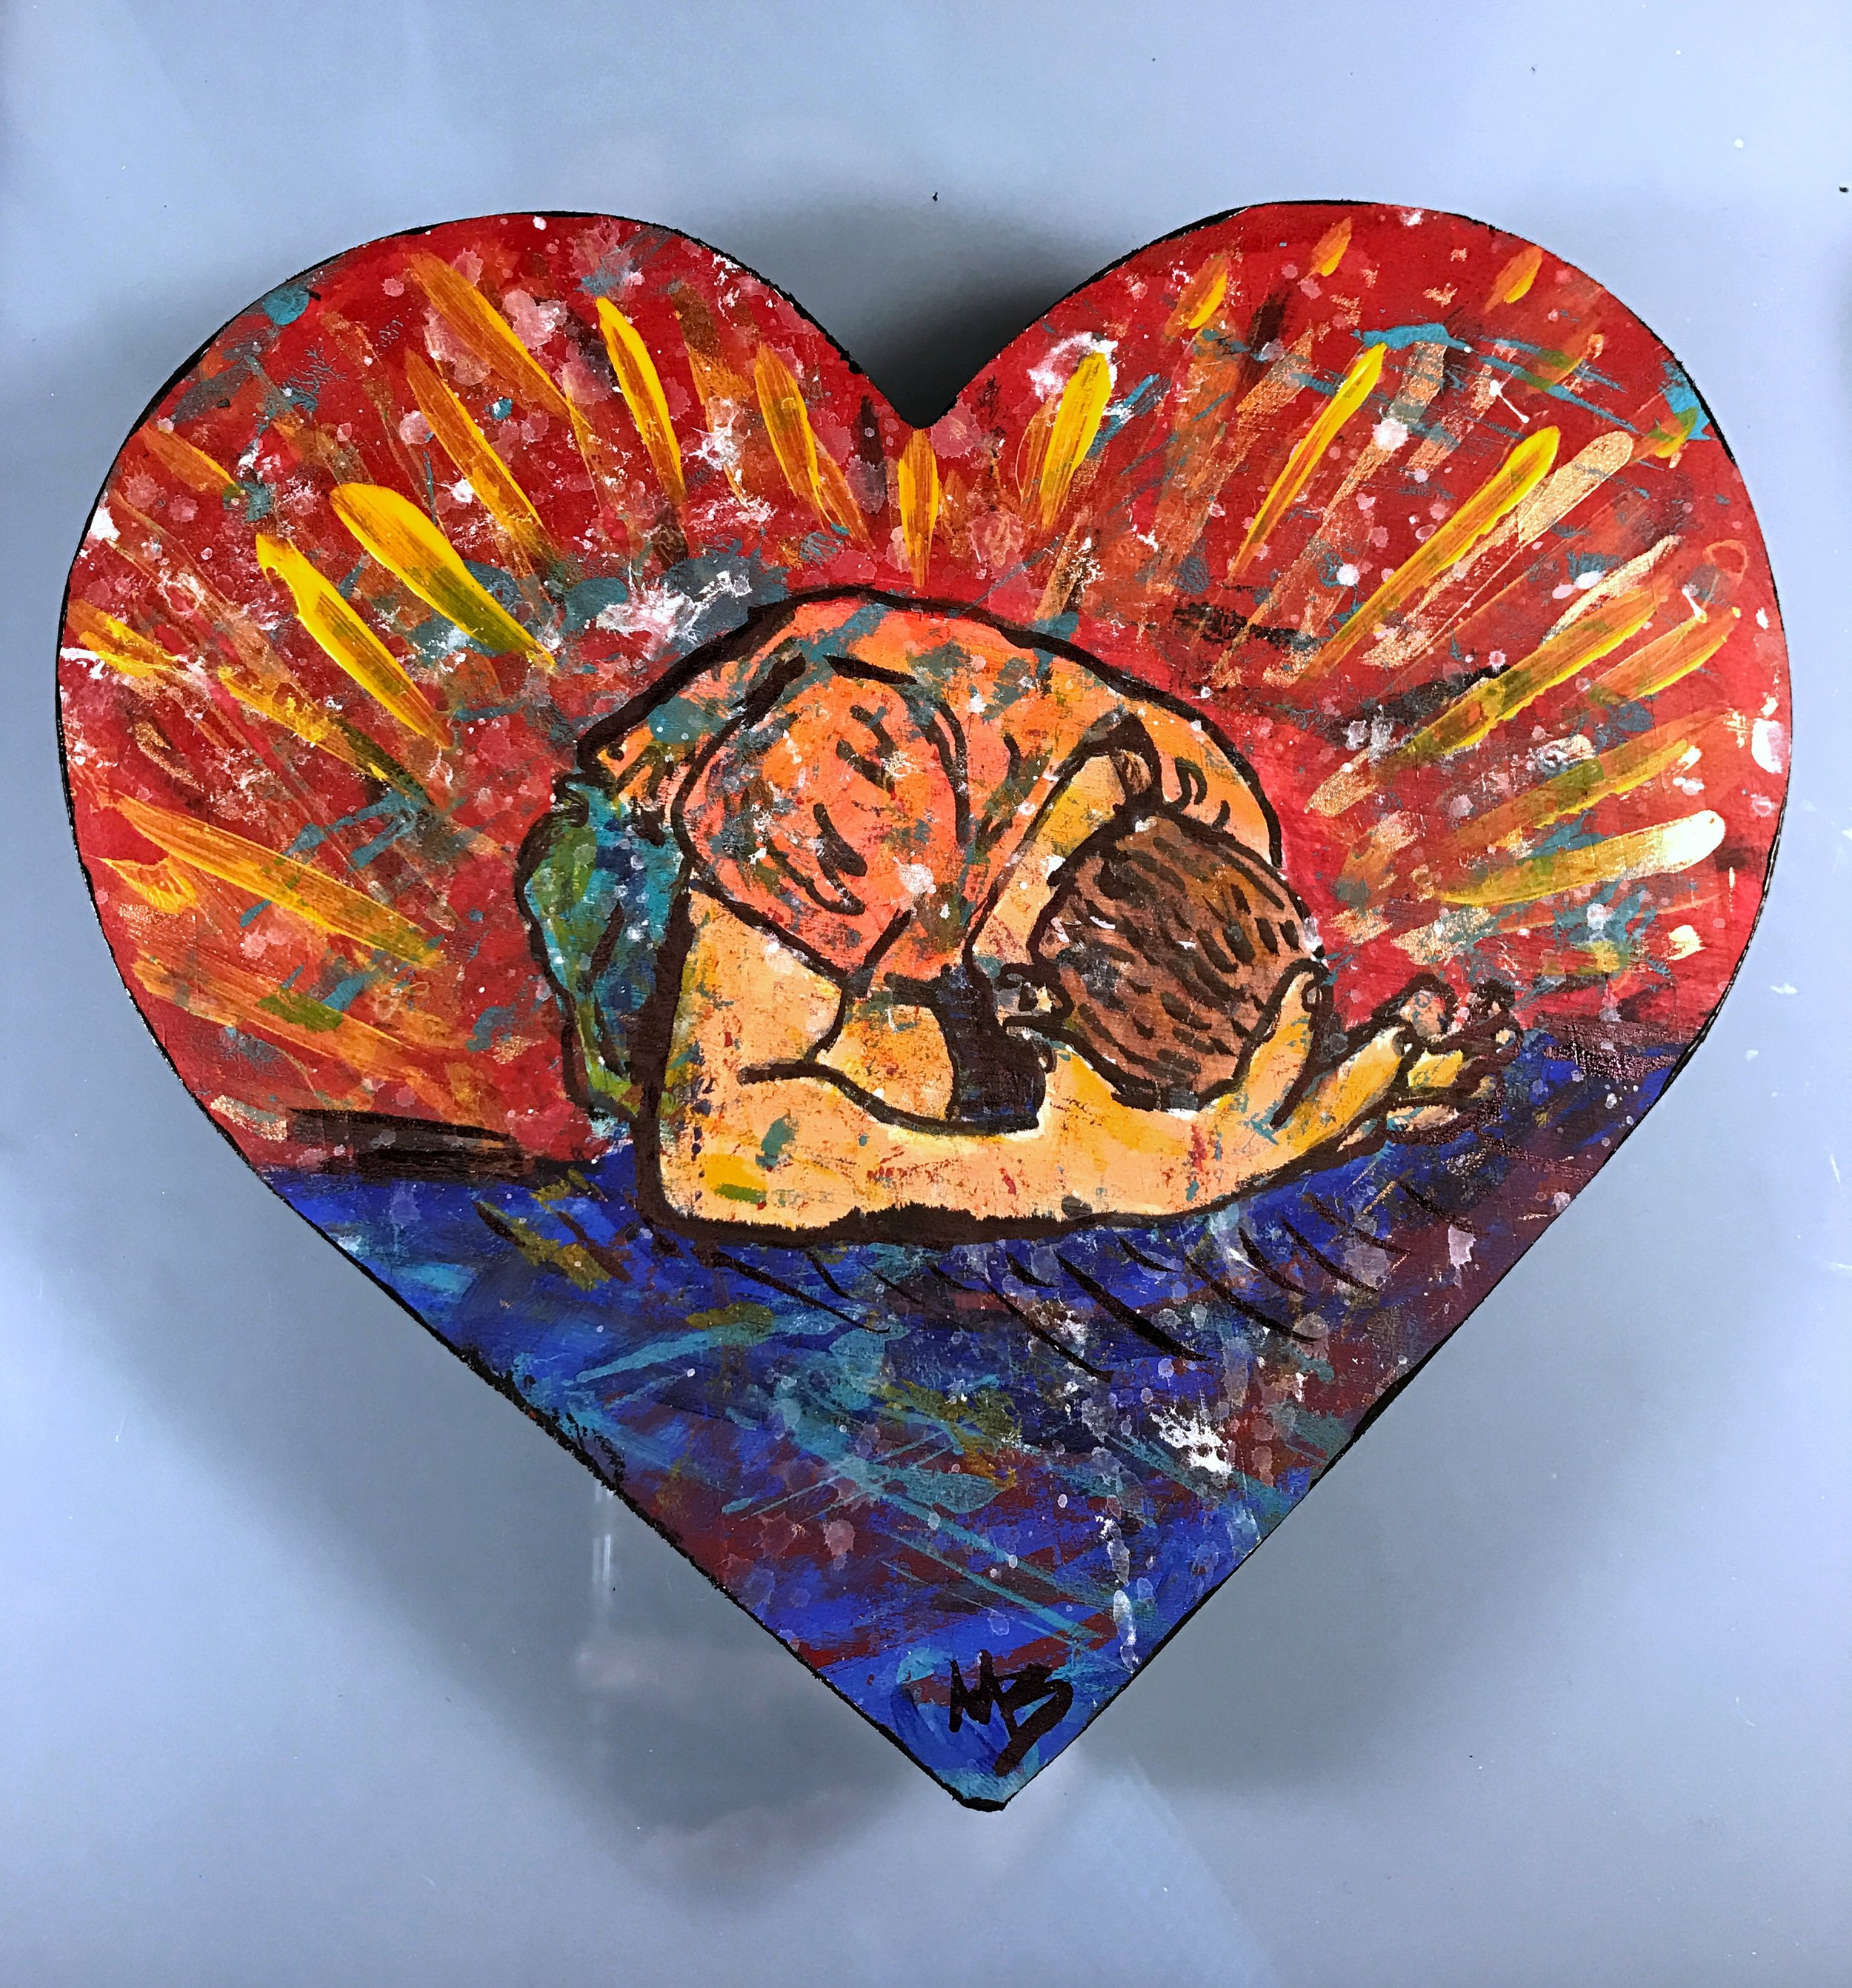 Heart Art Worship Surrender